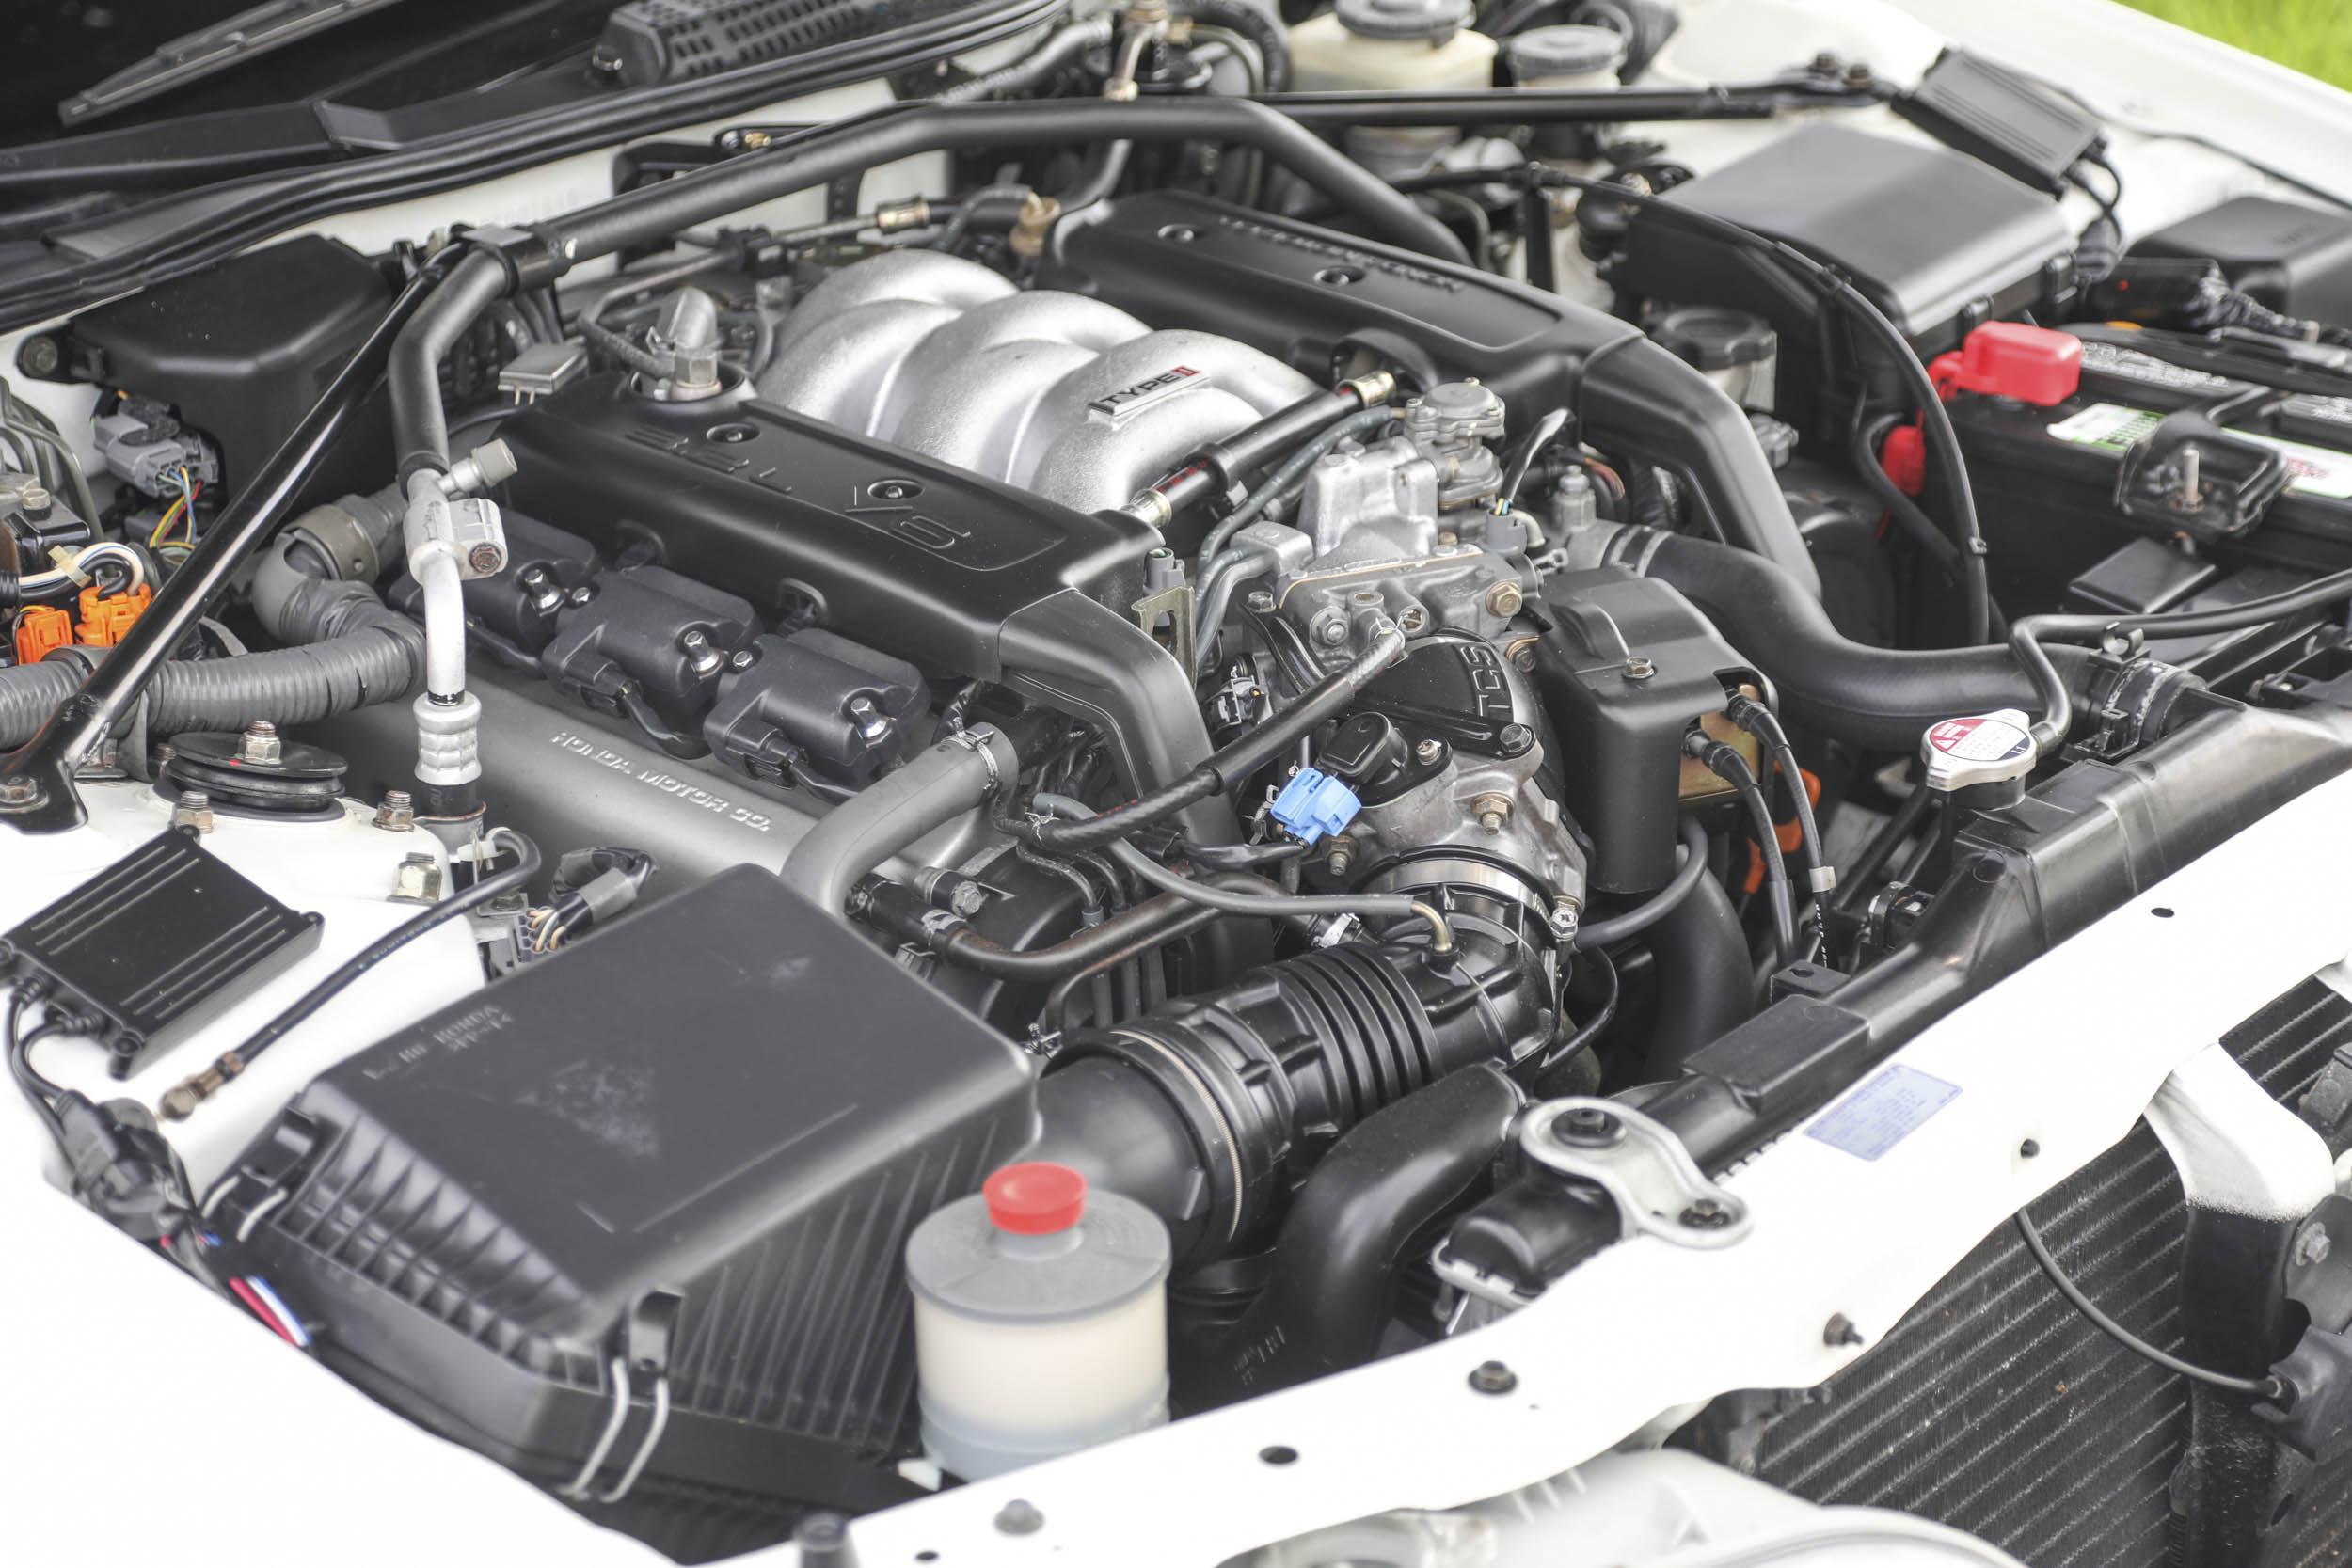 1994 Acura Legend Coupe LS engine